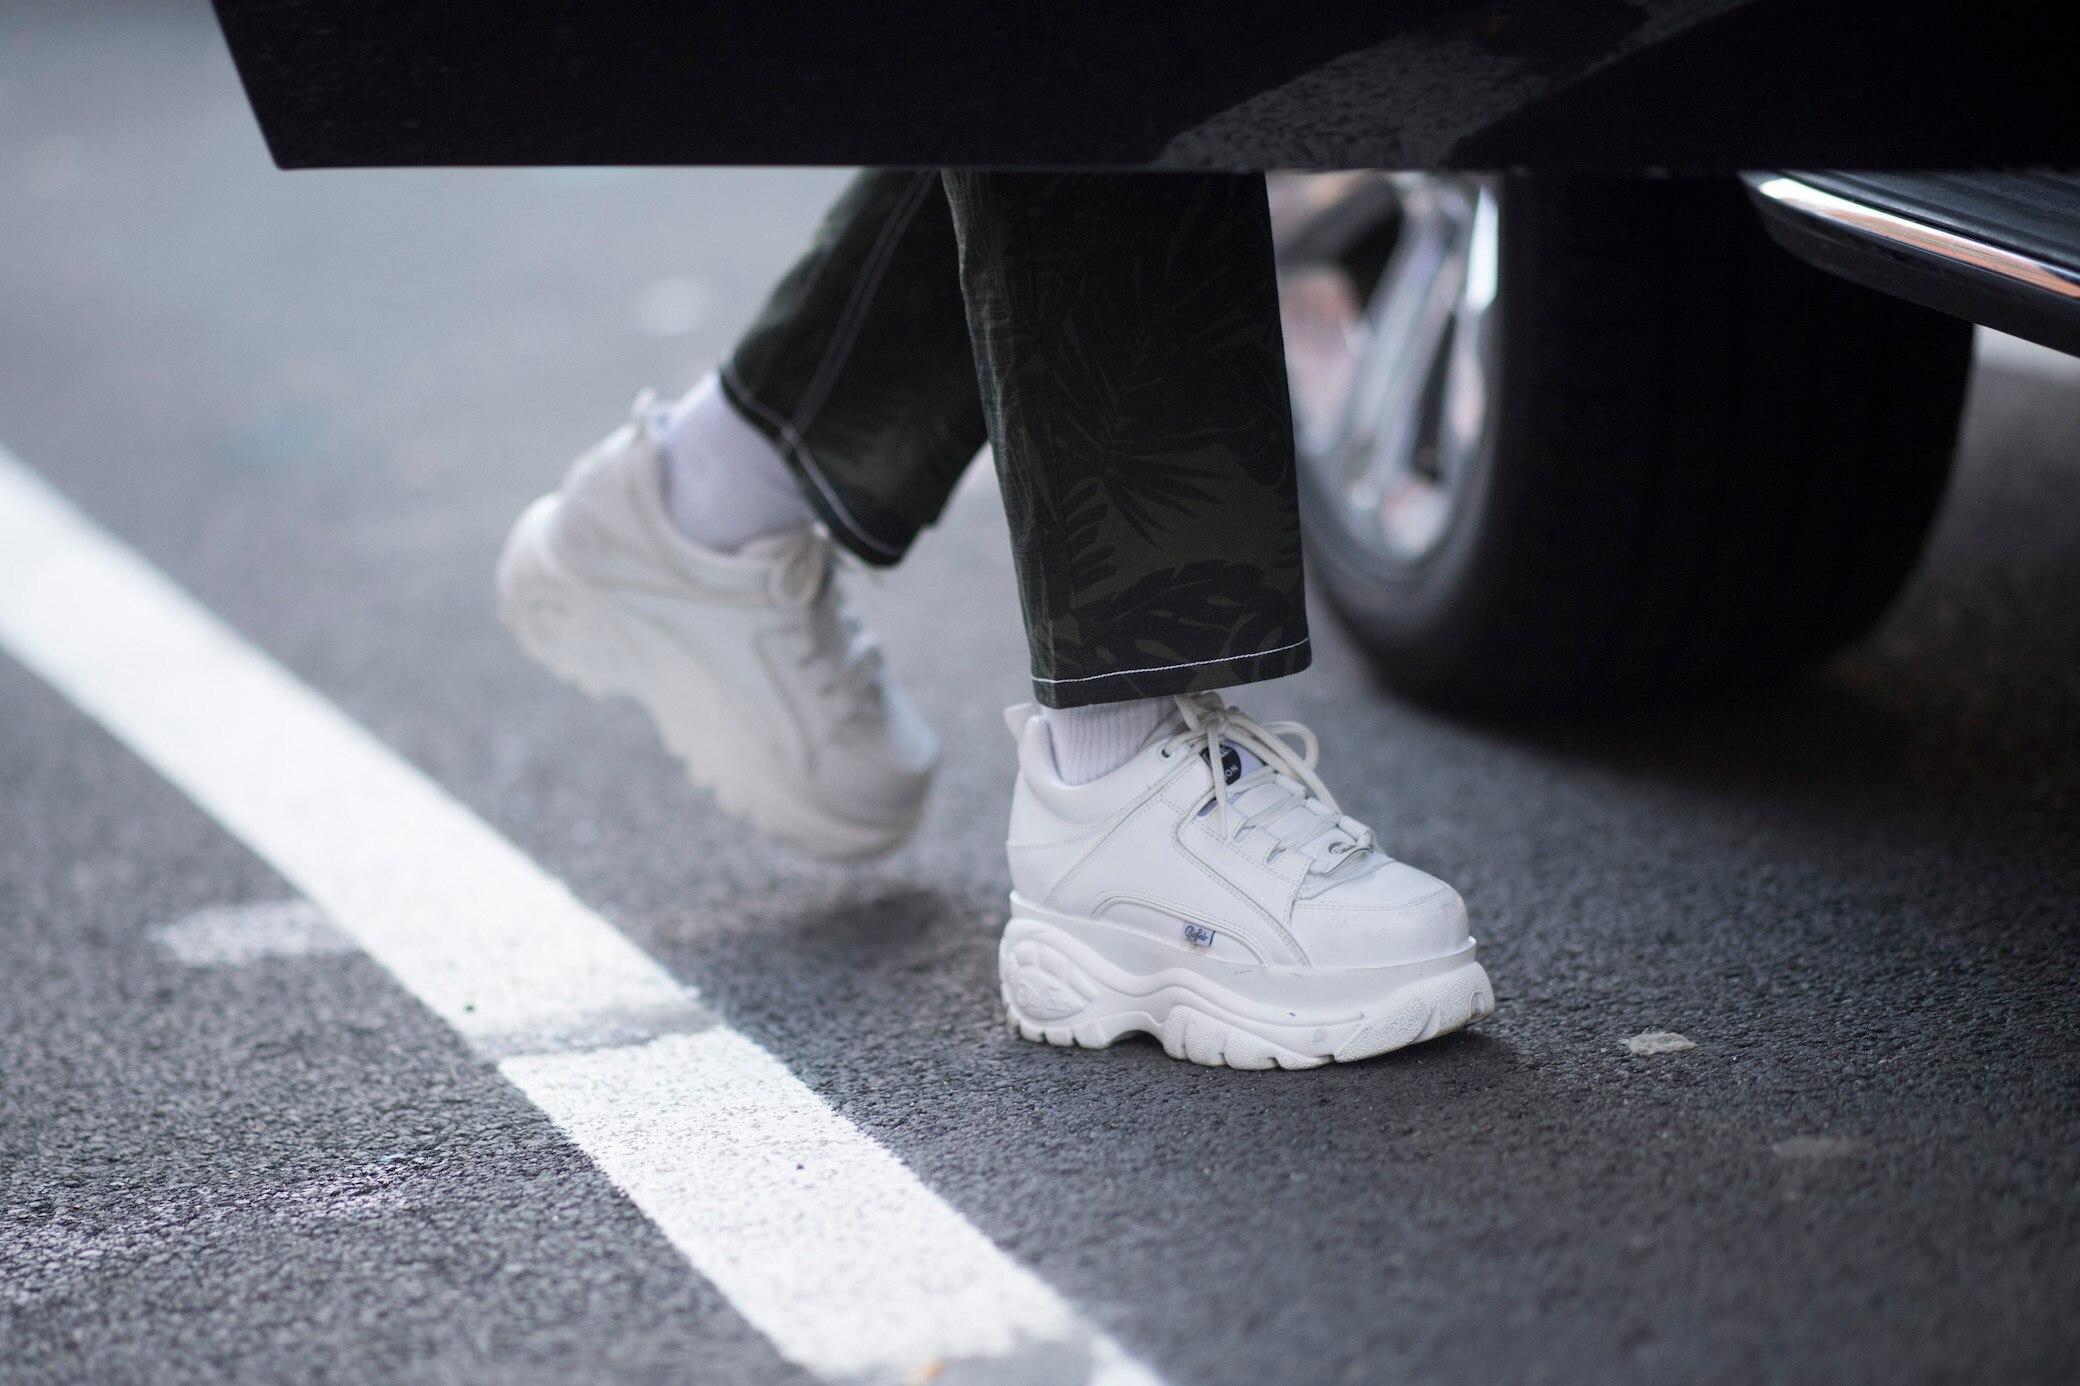 timeless design 89e8a 6b684 Trend: Wie trägt man Buffalo-Sneaker? | STYLEBOOK